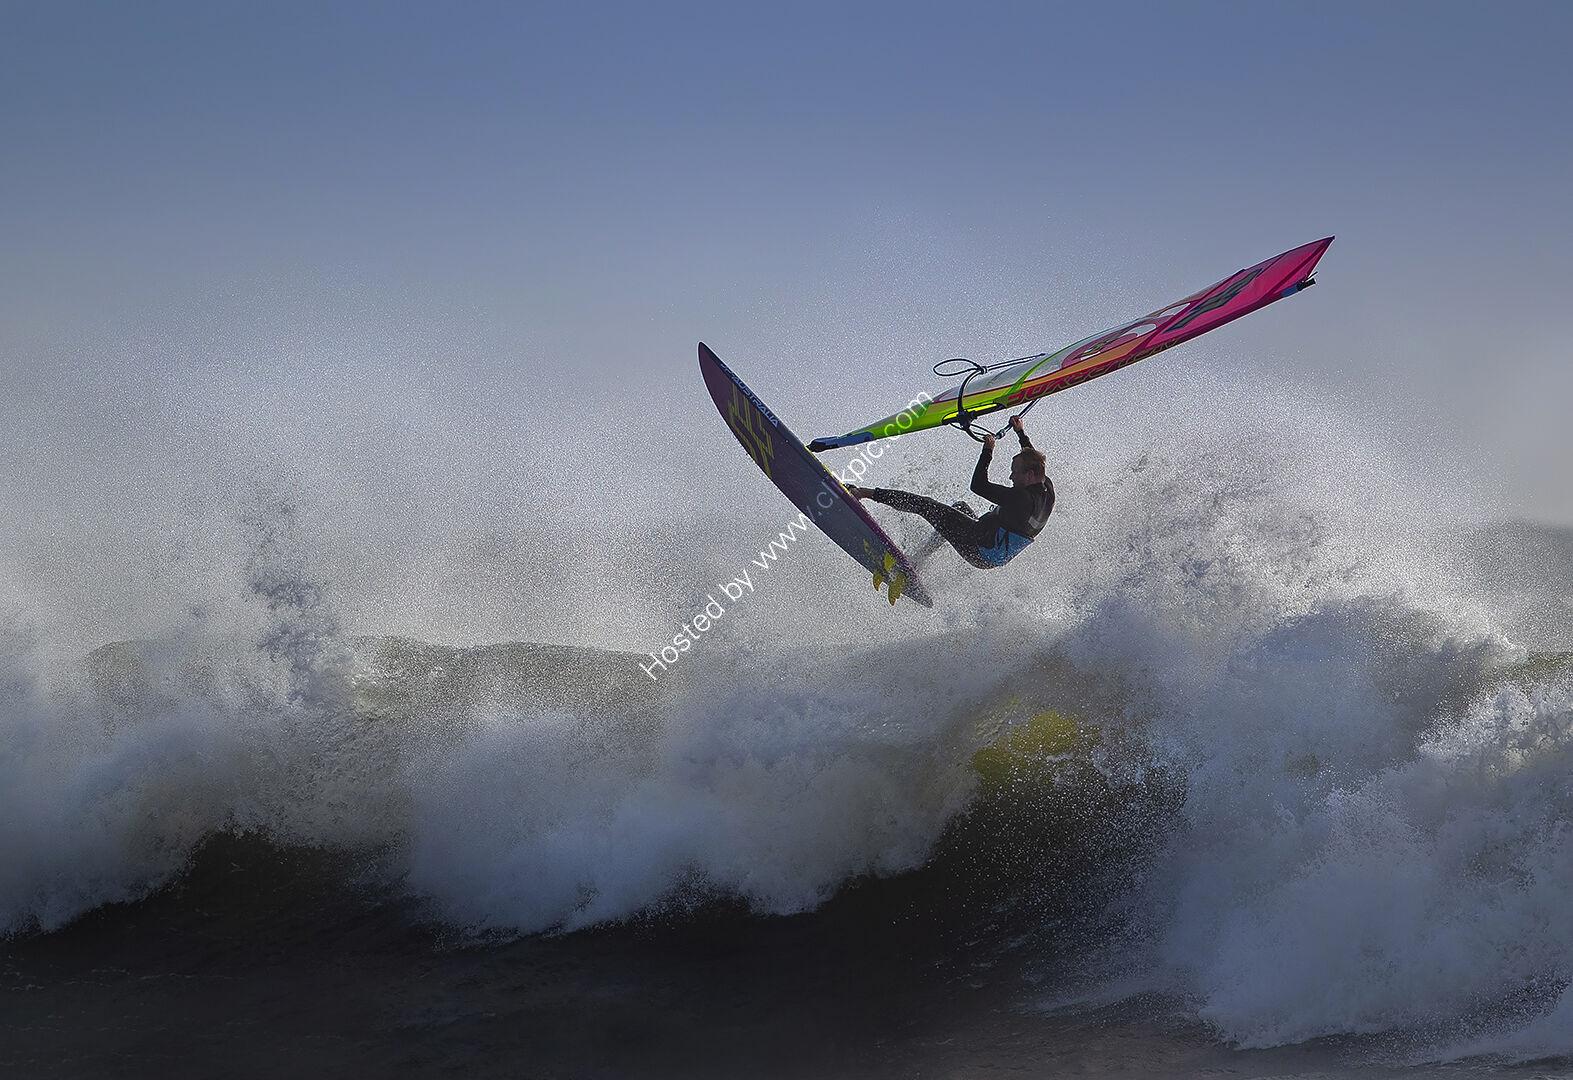 Jumping a backlit wave